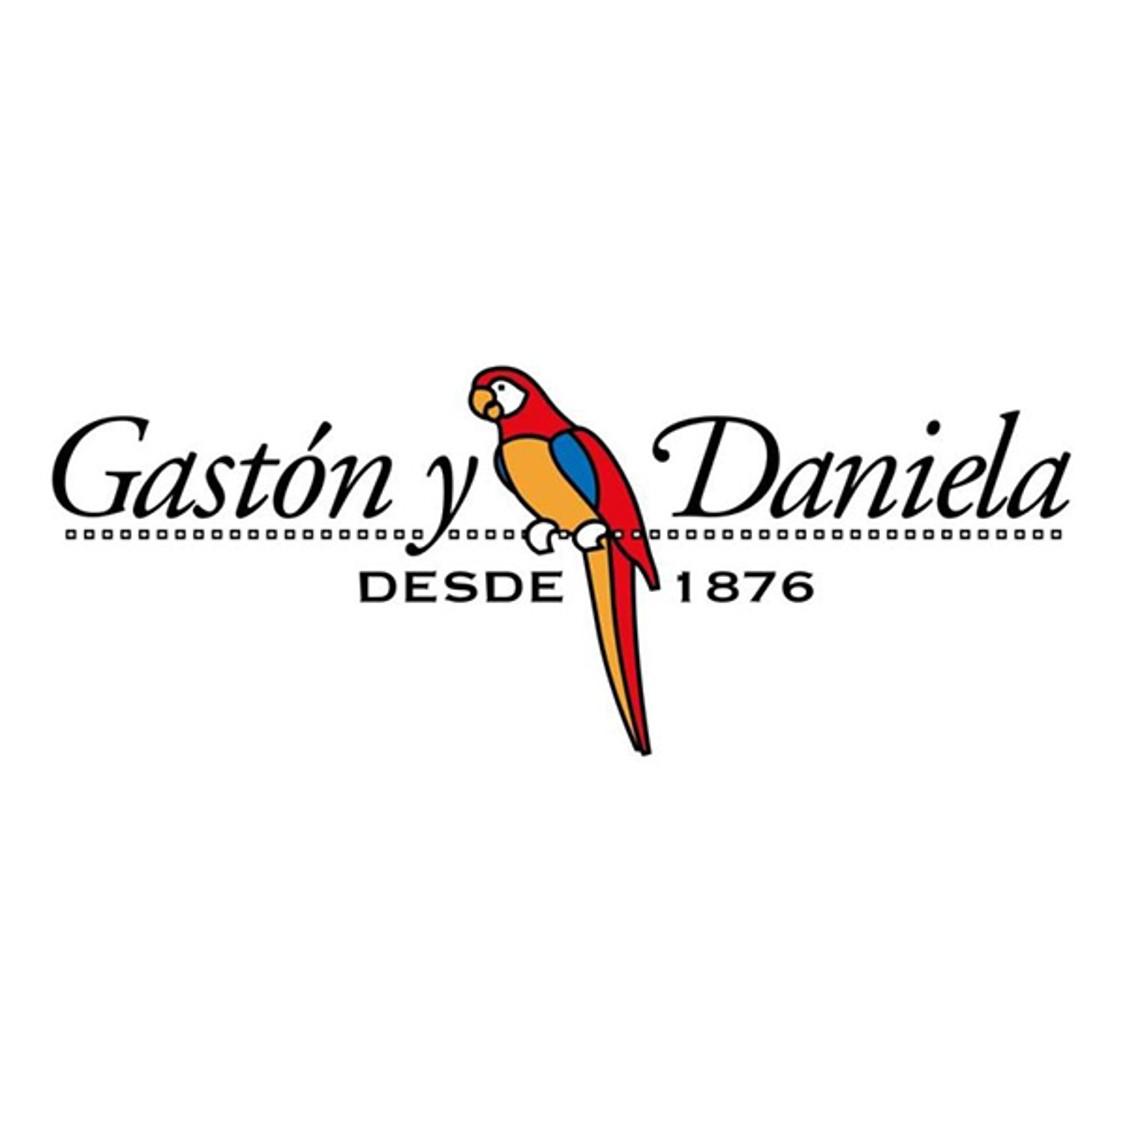 https://anafexmainteriorismo.com/wp-content/uploads/2018/06/Gaston-y-Daniela.png.jpg